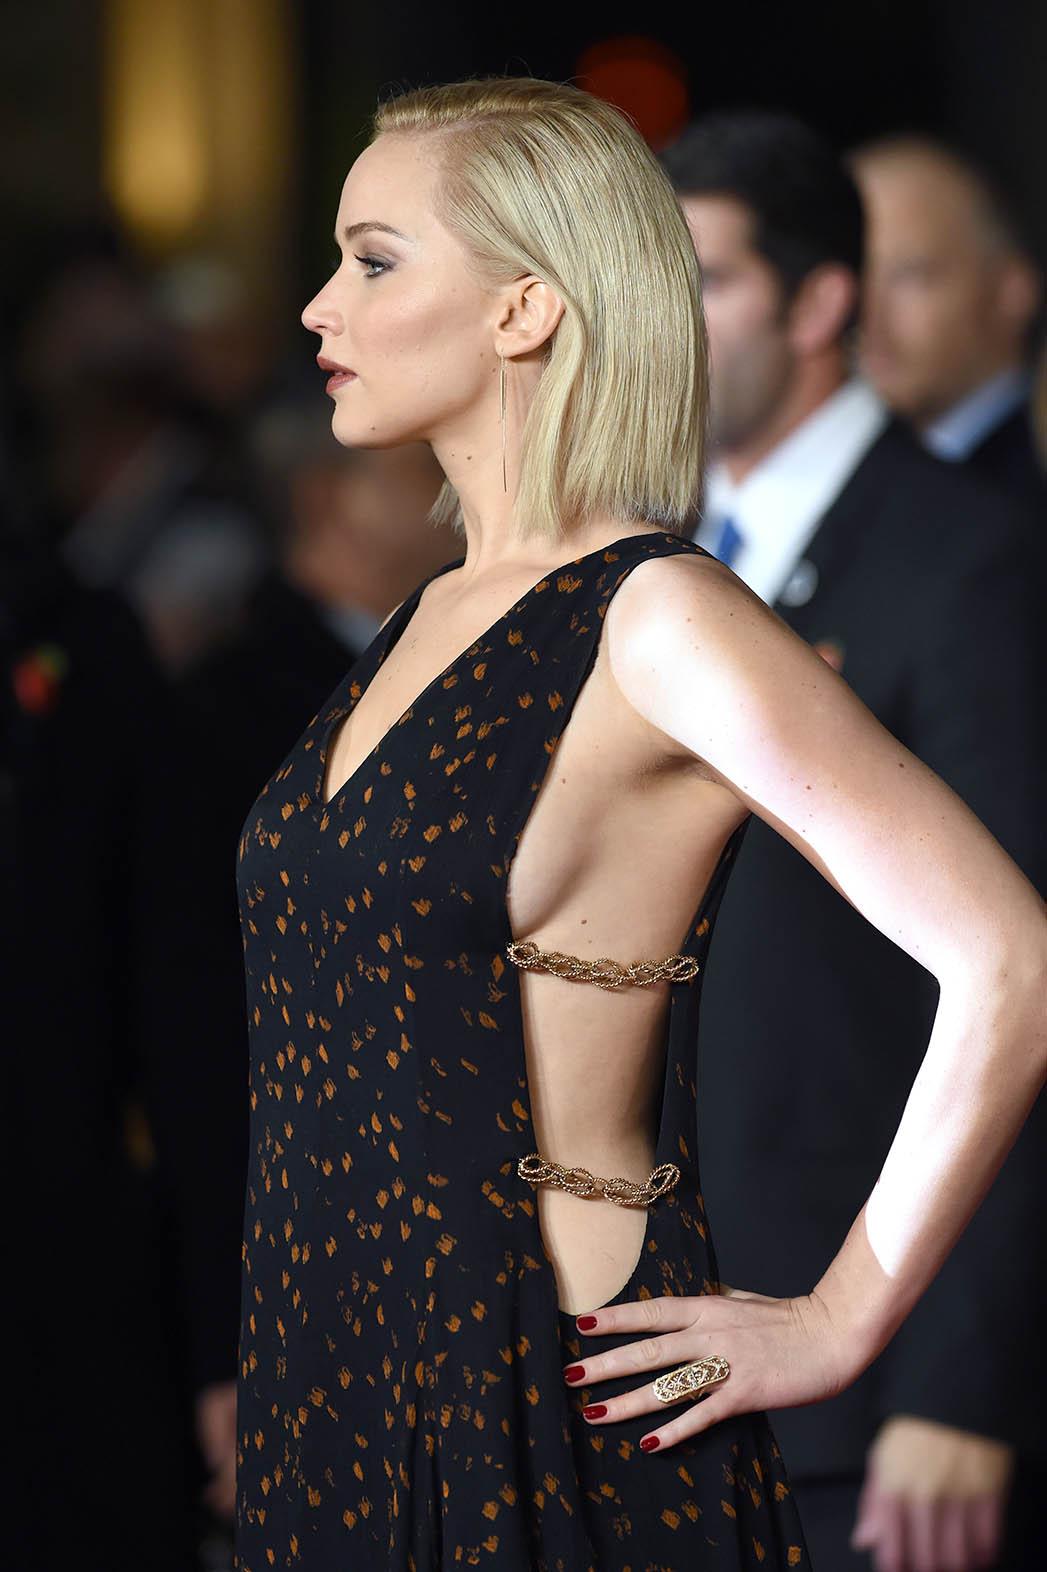 Jennifer Lawrence The Hunger Games Mockingjay Part 2 film premiere - P 2015